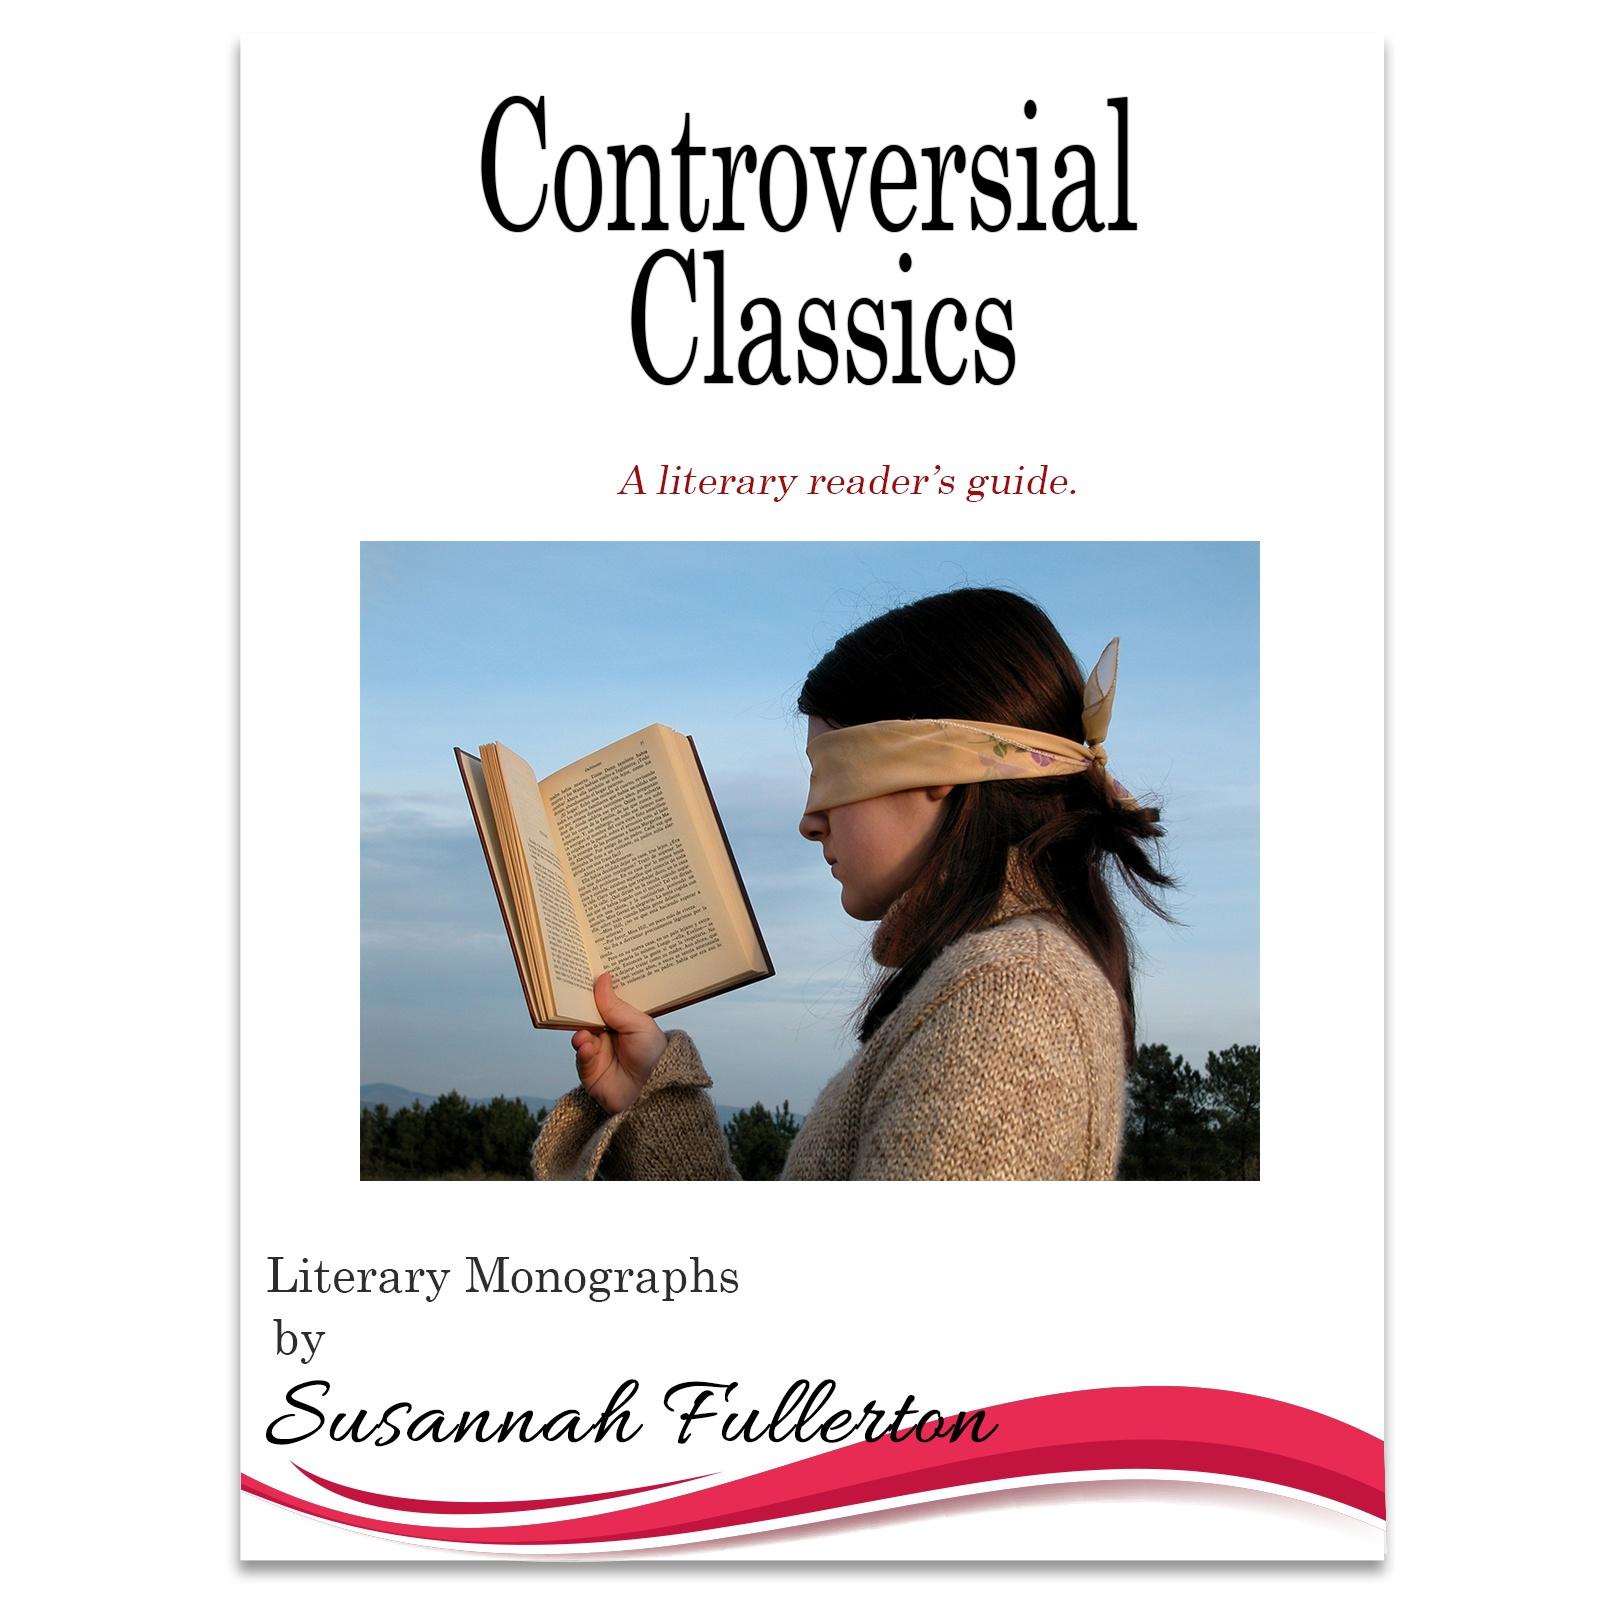 Controversial Classics